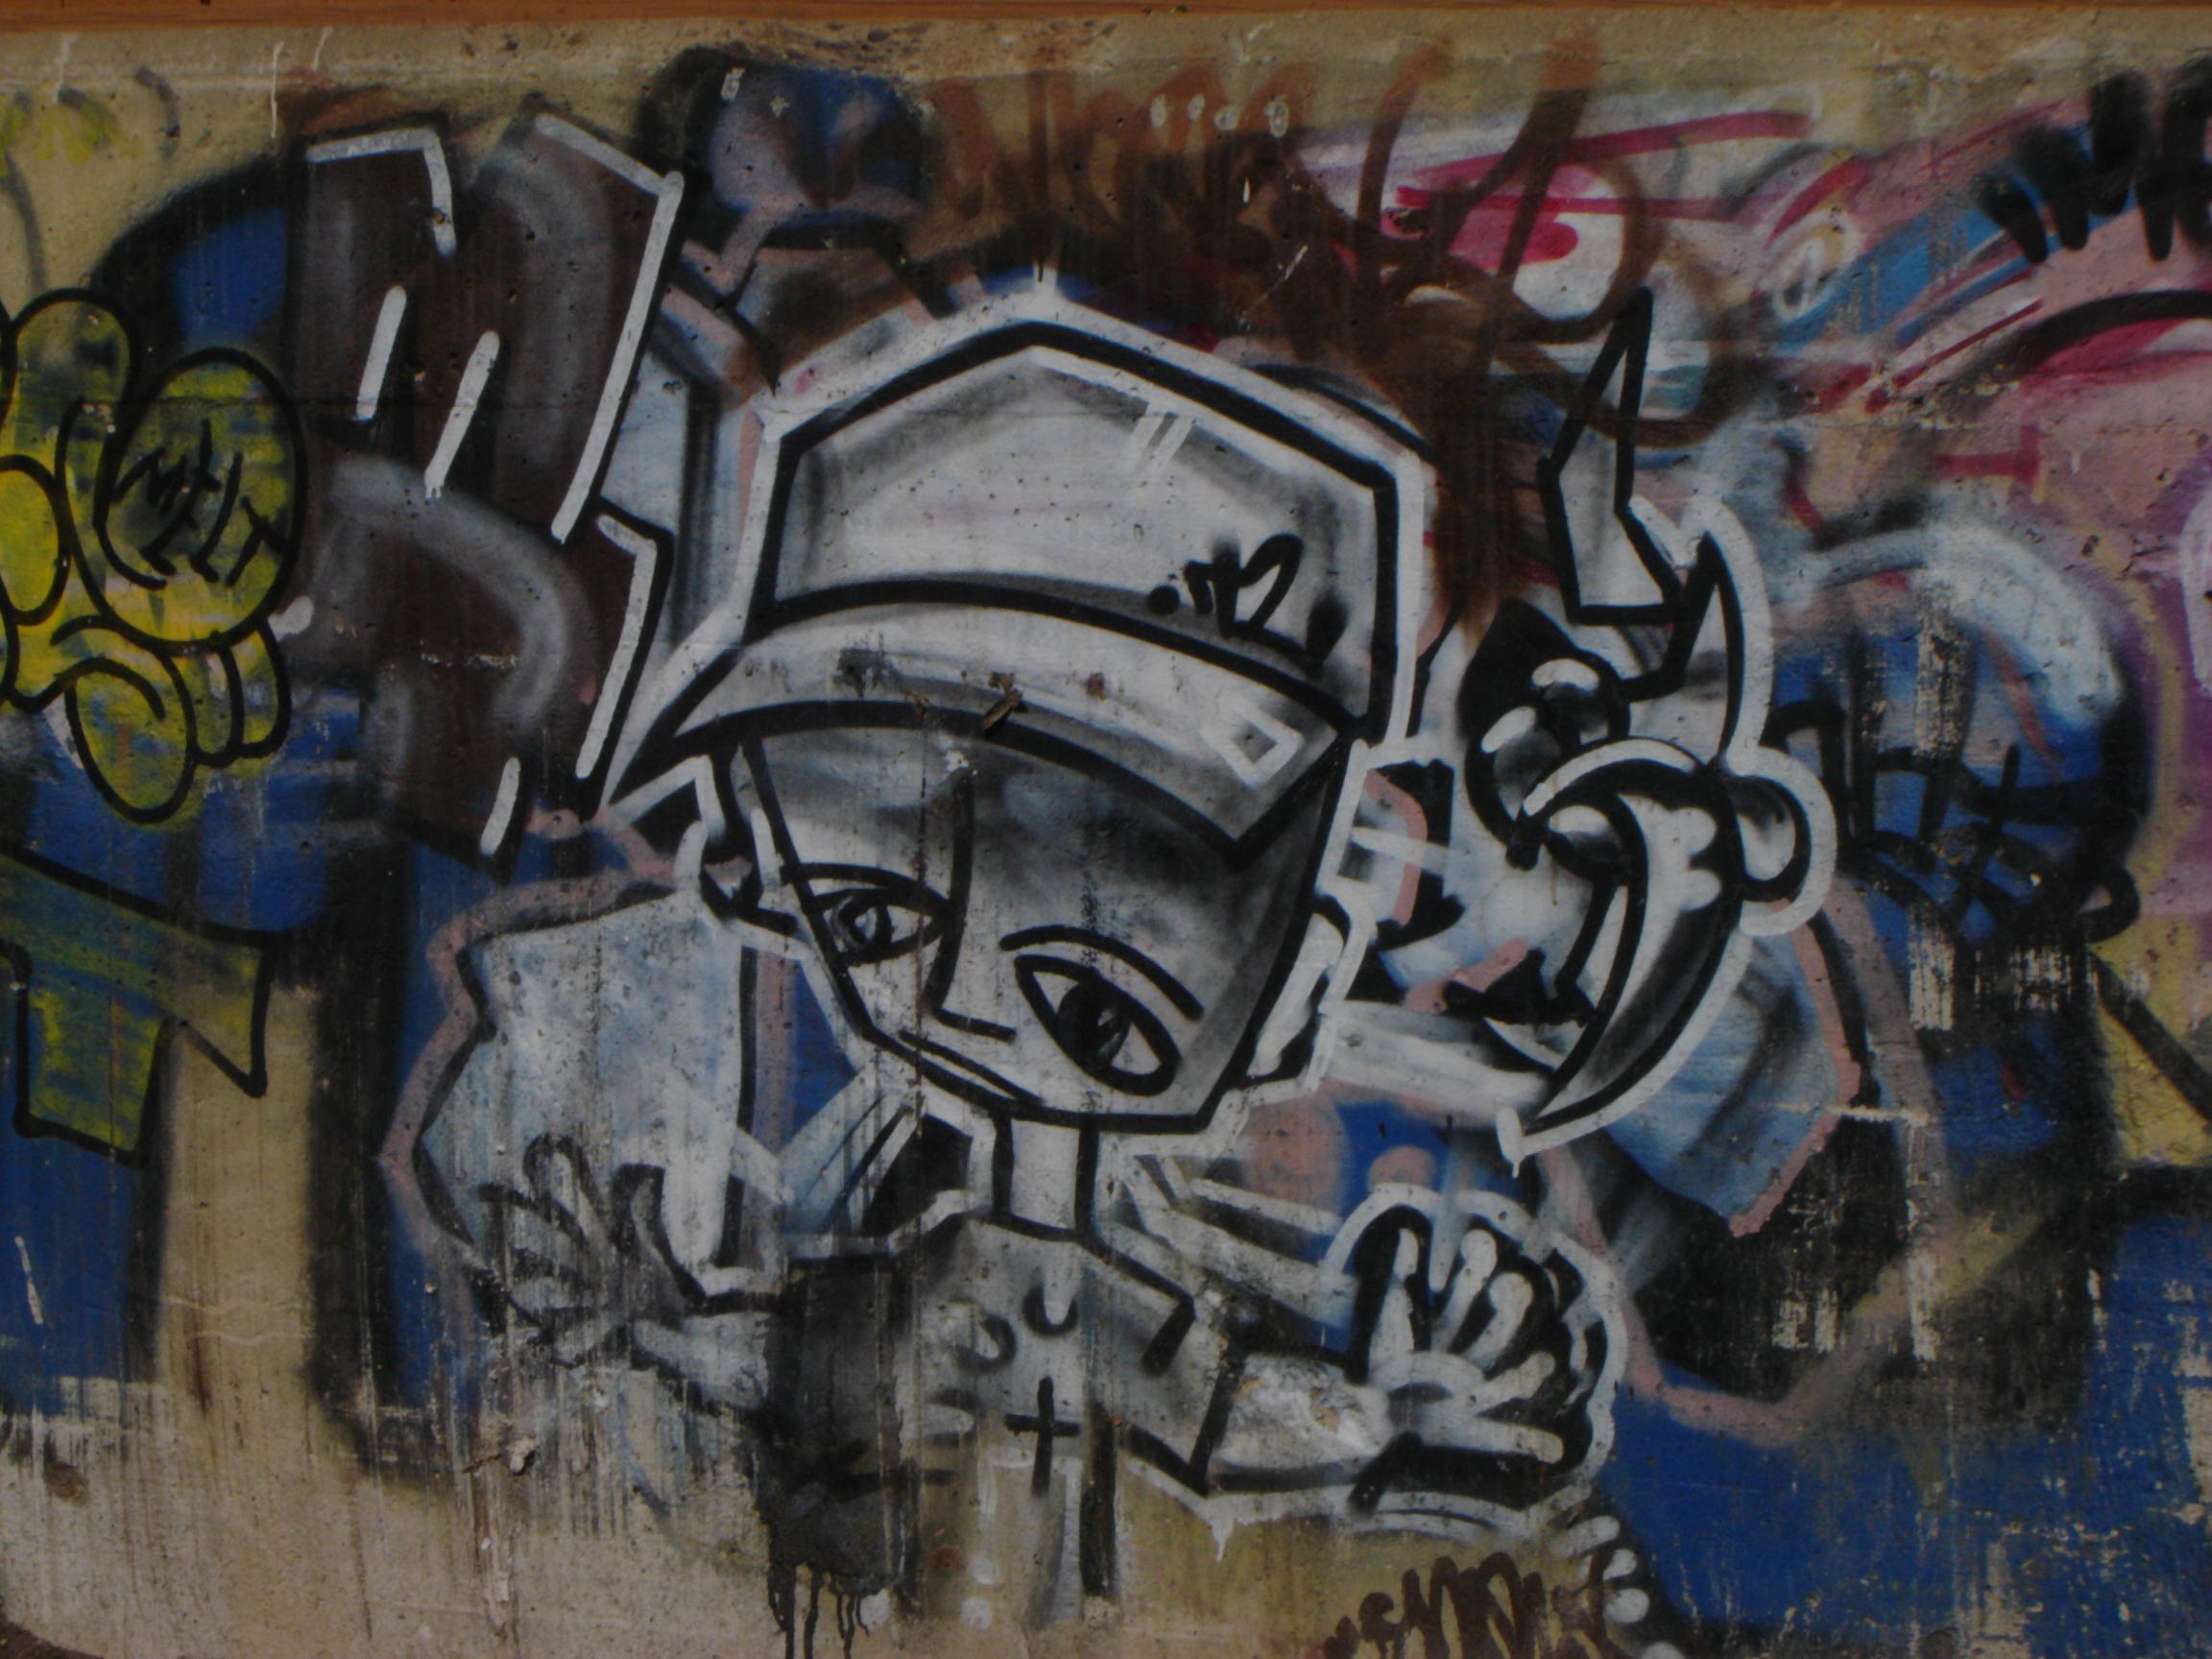 graffiti 3 by Lovelystock